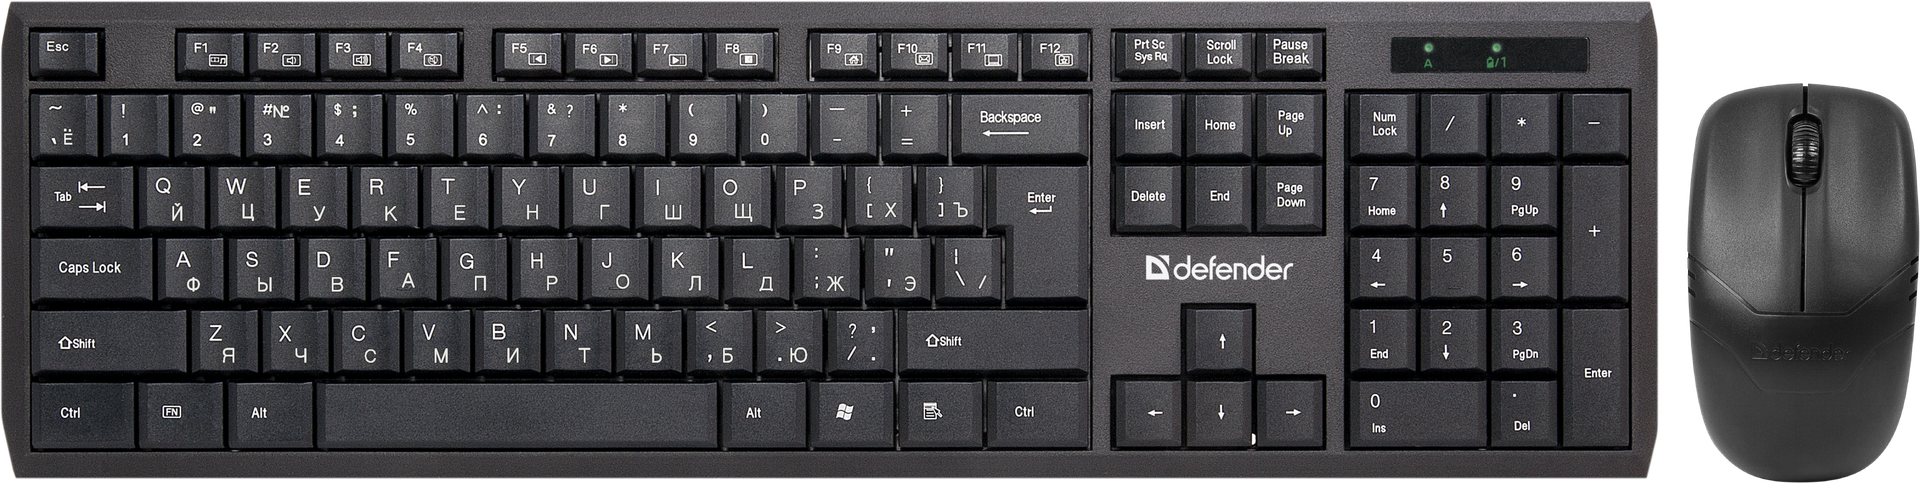 Комплект клавиатура+мышь Defender Harvard C-945 (45945)